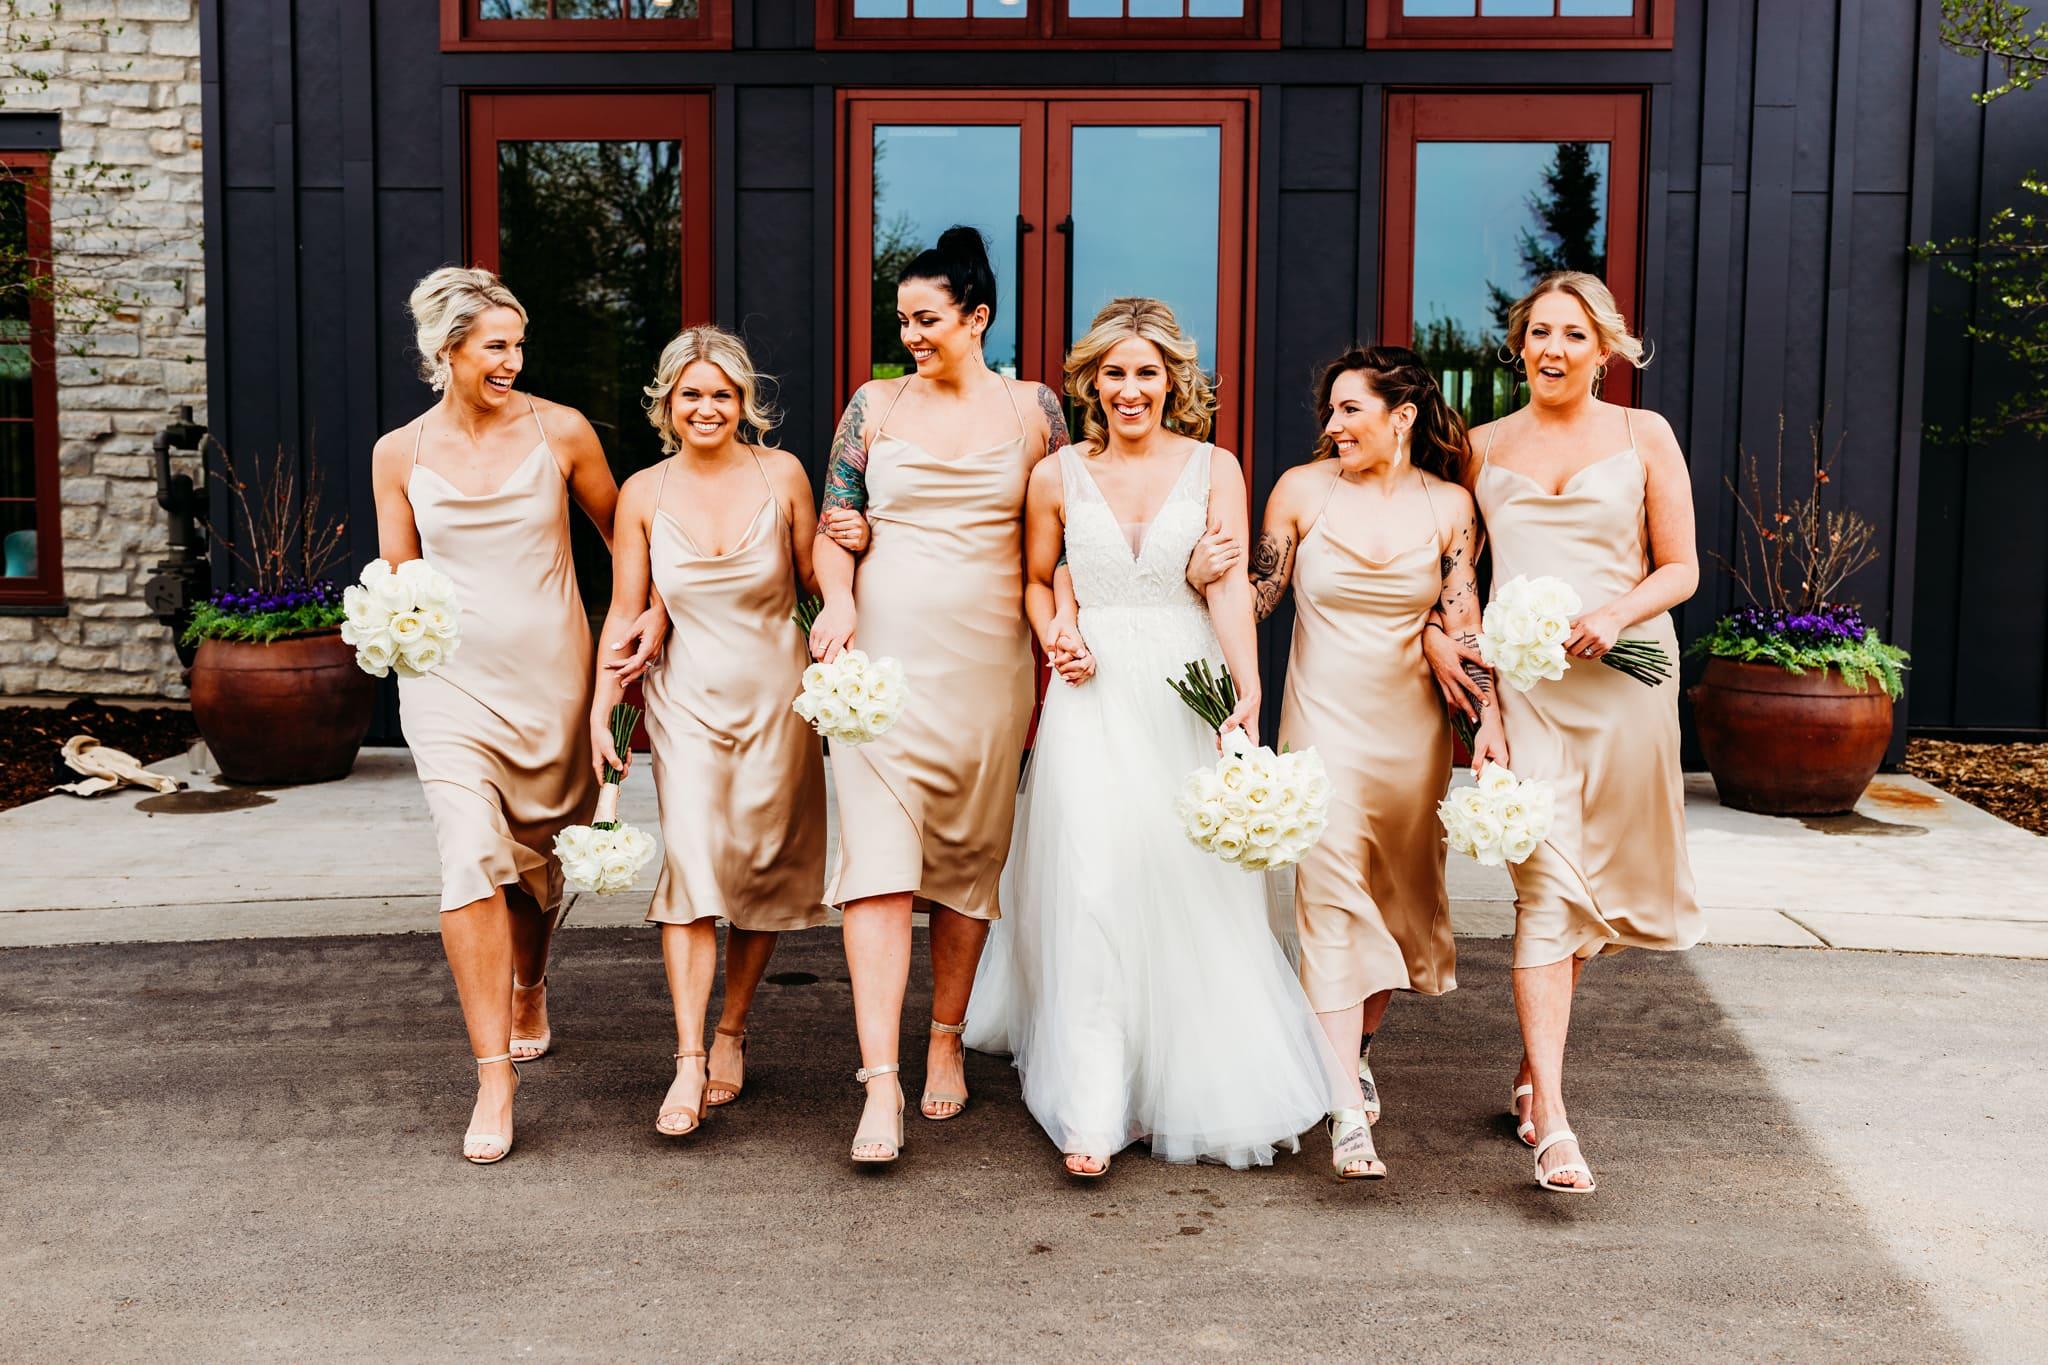 Bride walks outside at her Hazeltine National Golf Club wedding with her bridesmaids